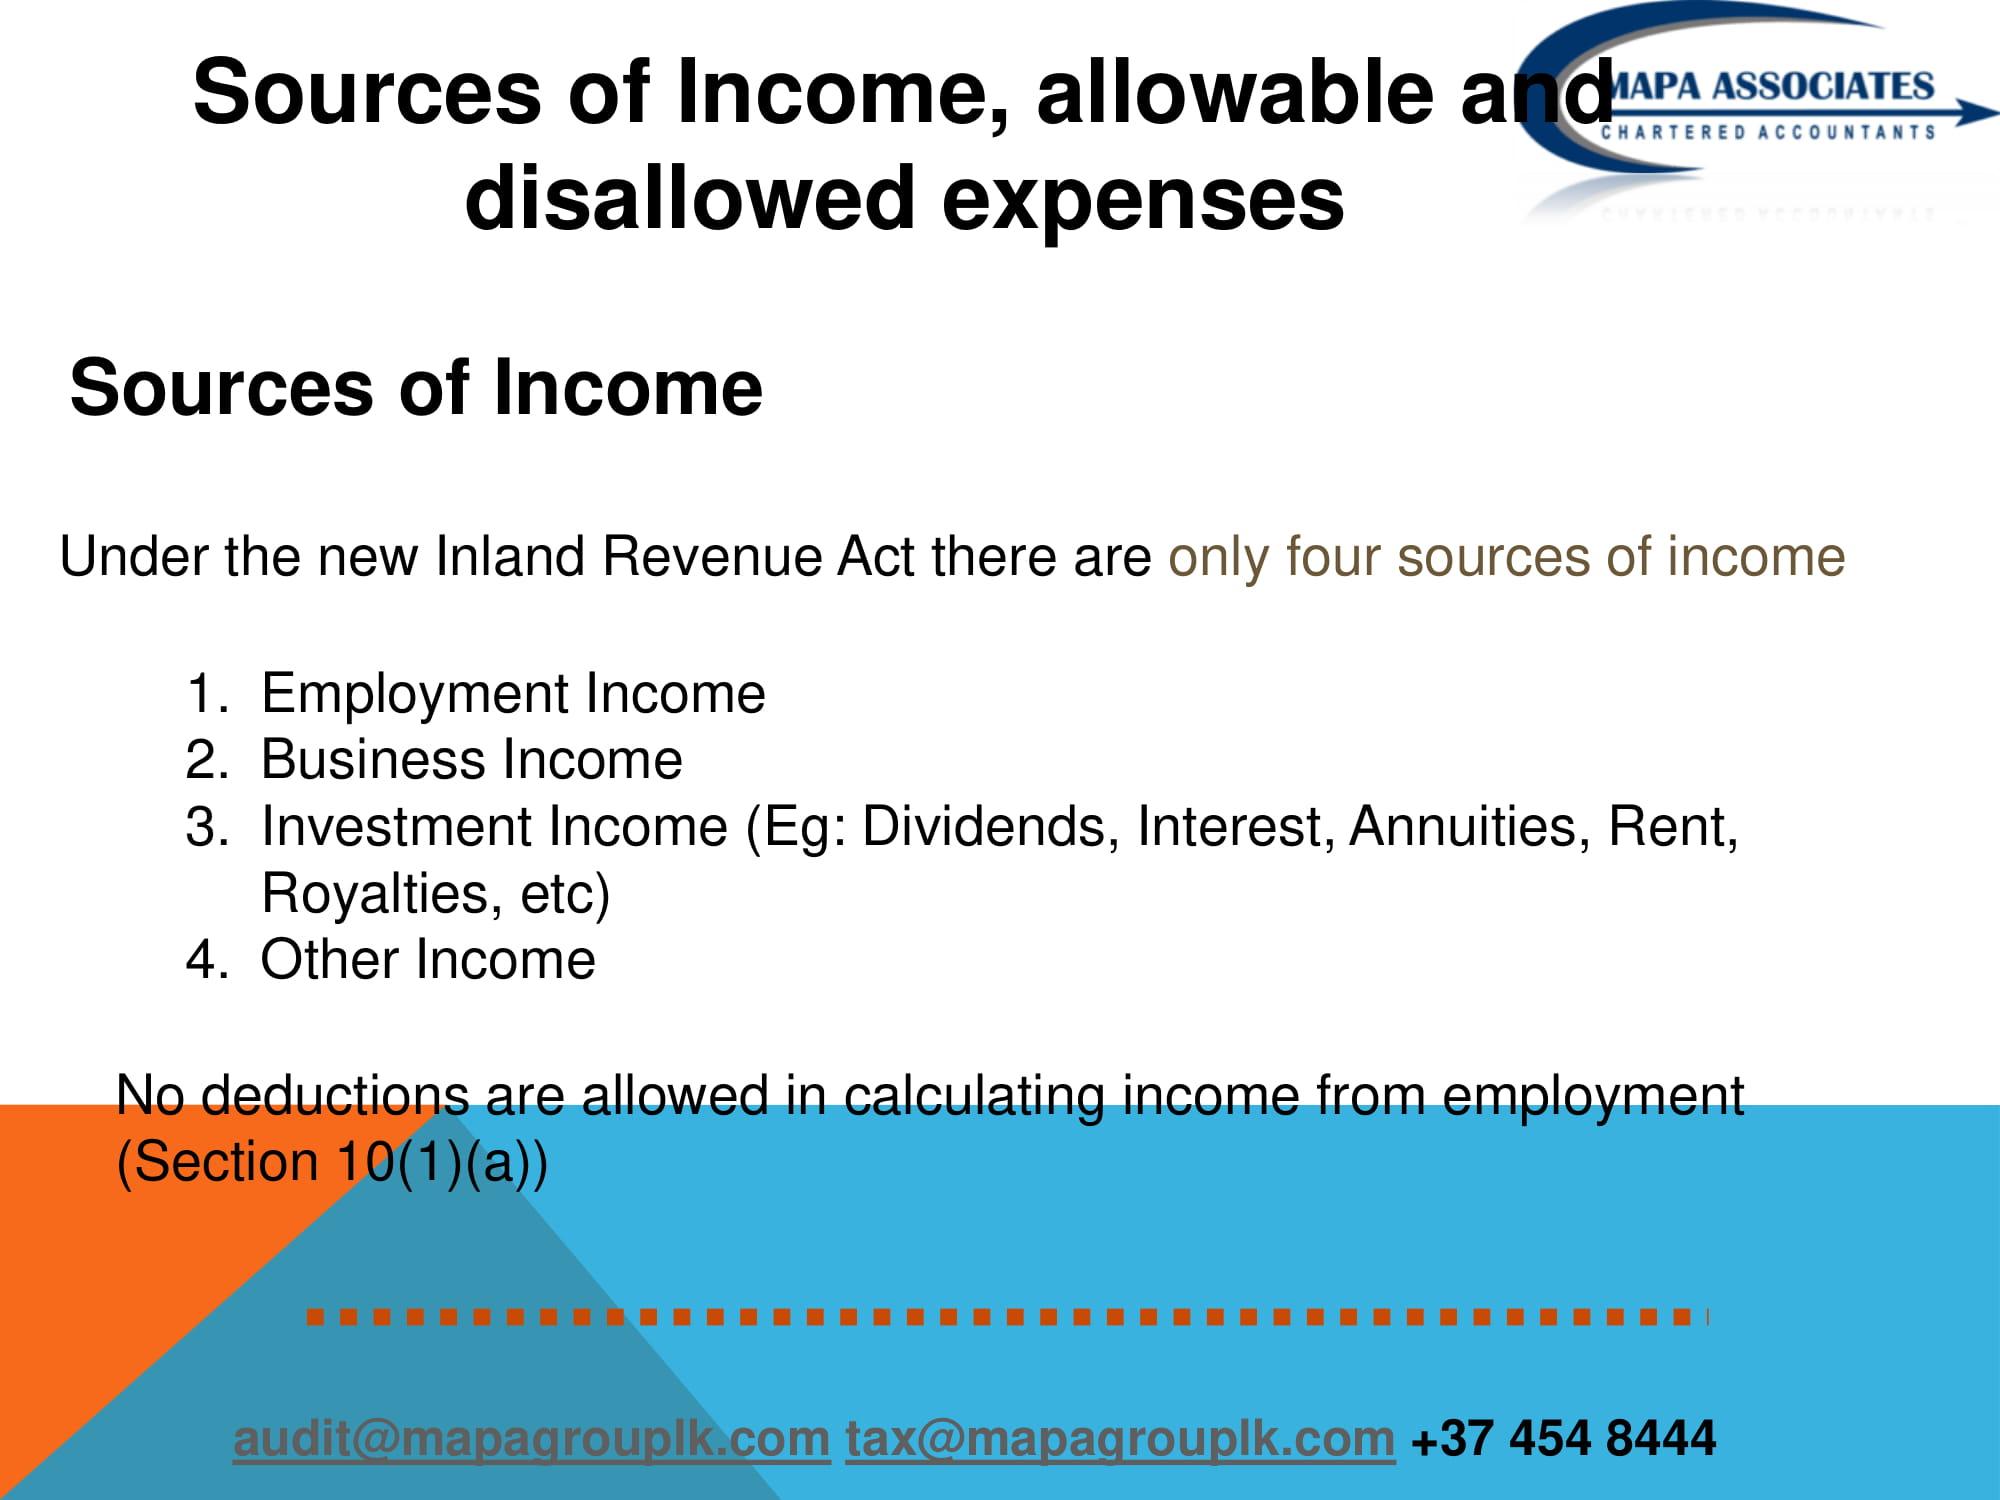 Sri Lanka New inland Revenue Act 2018 | MAPA ASSOCIATES